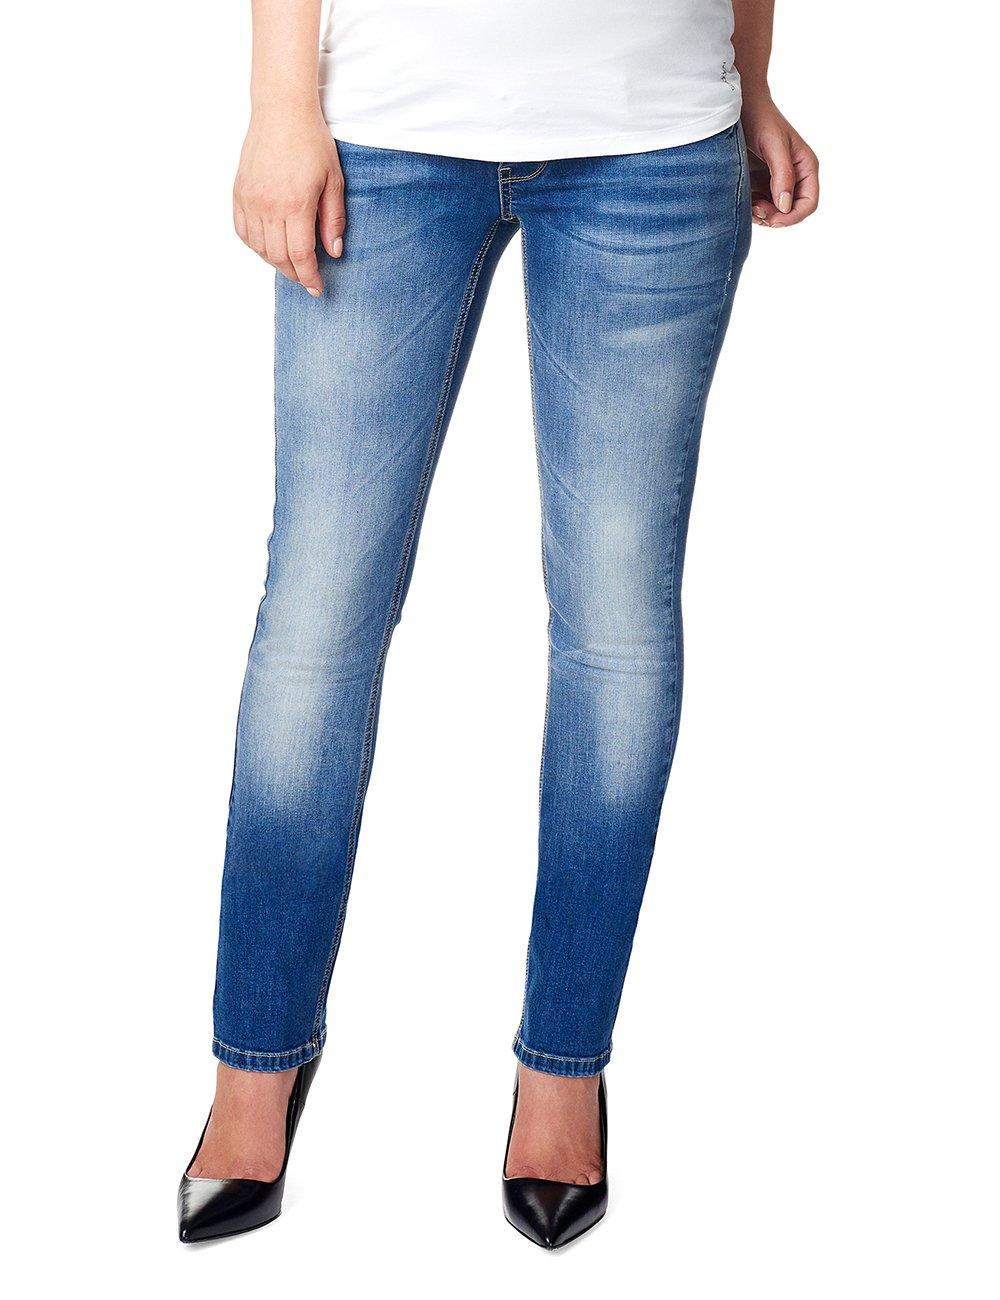 Womens Jeans OTB reg Karen Maternity Jeans Noppies 0mQYh2t